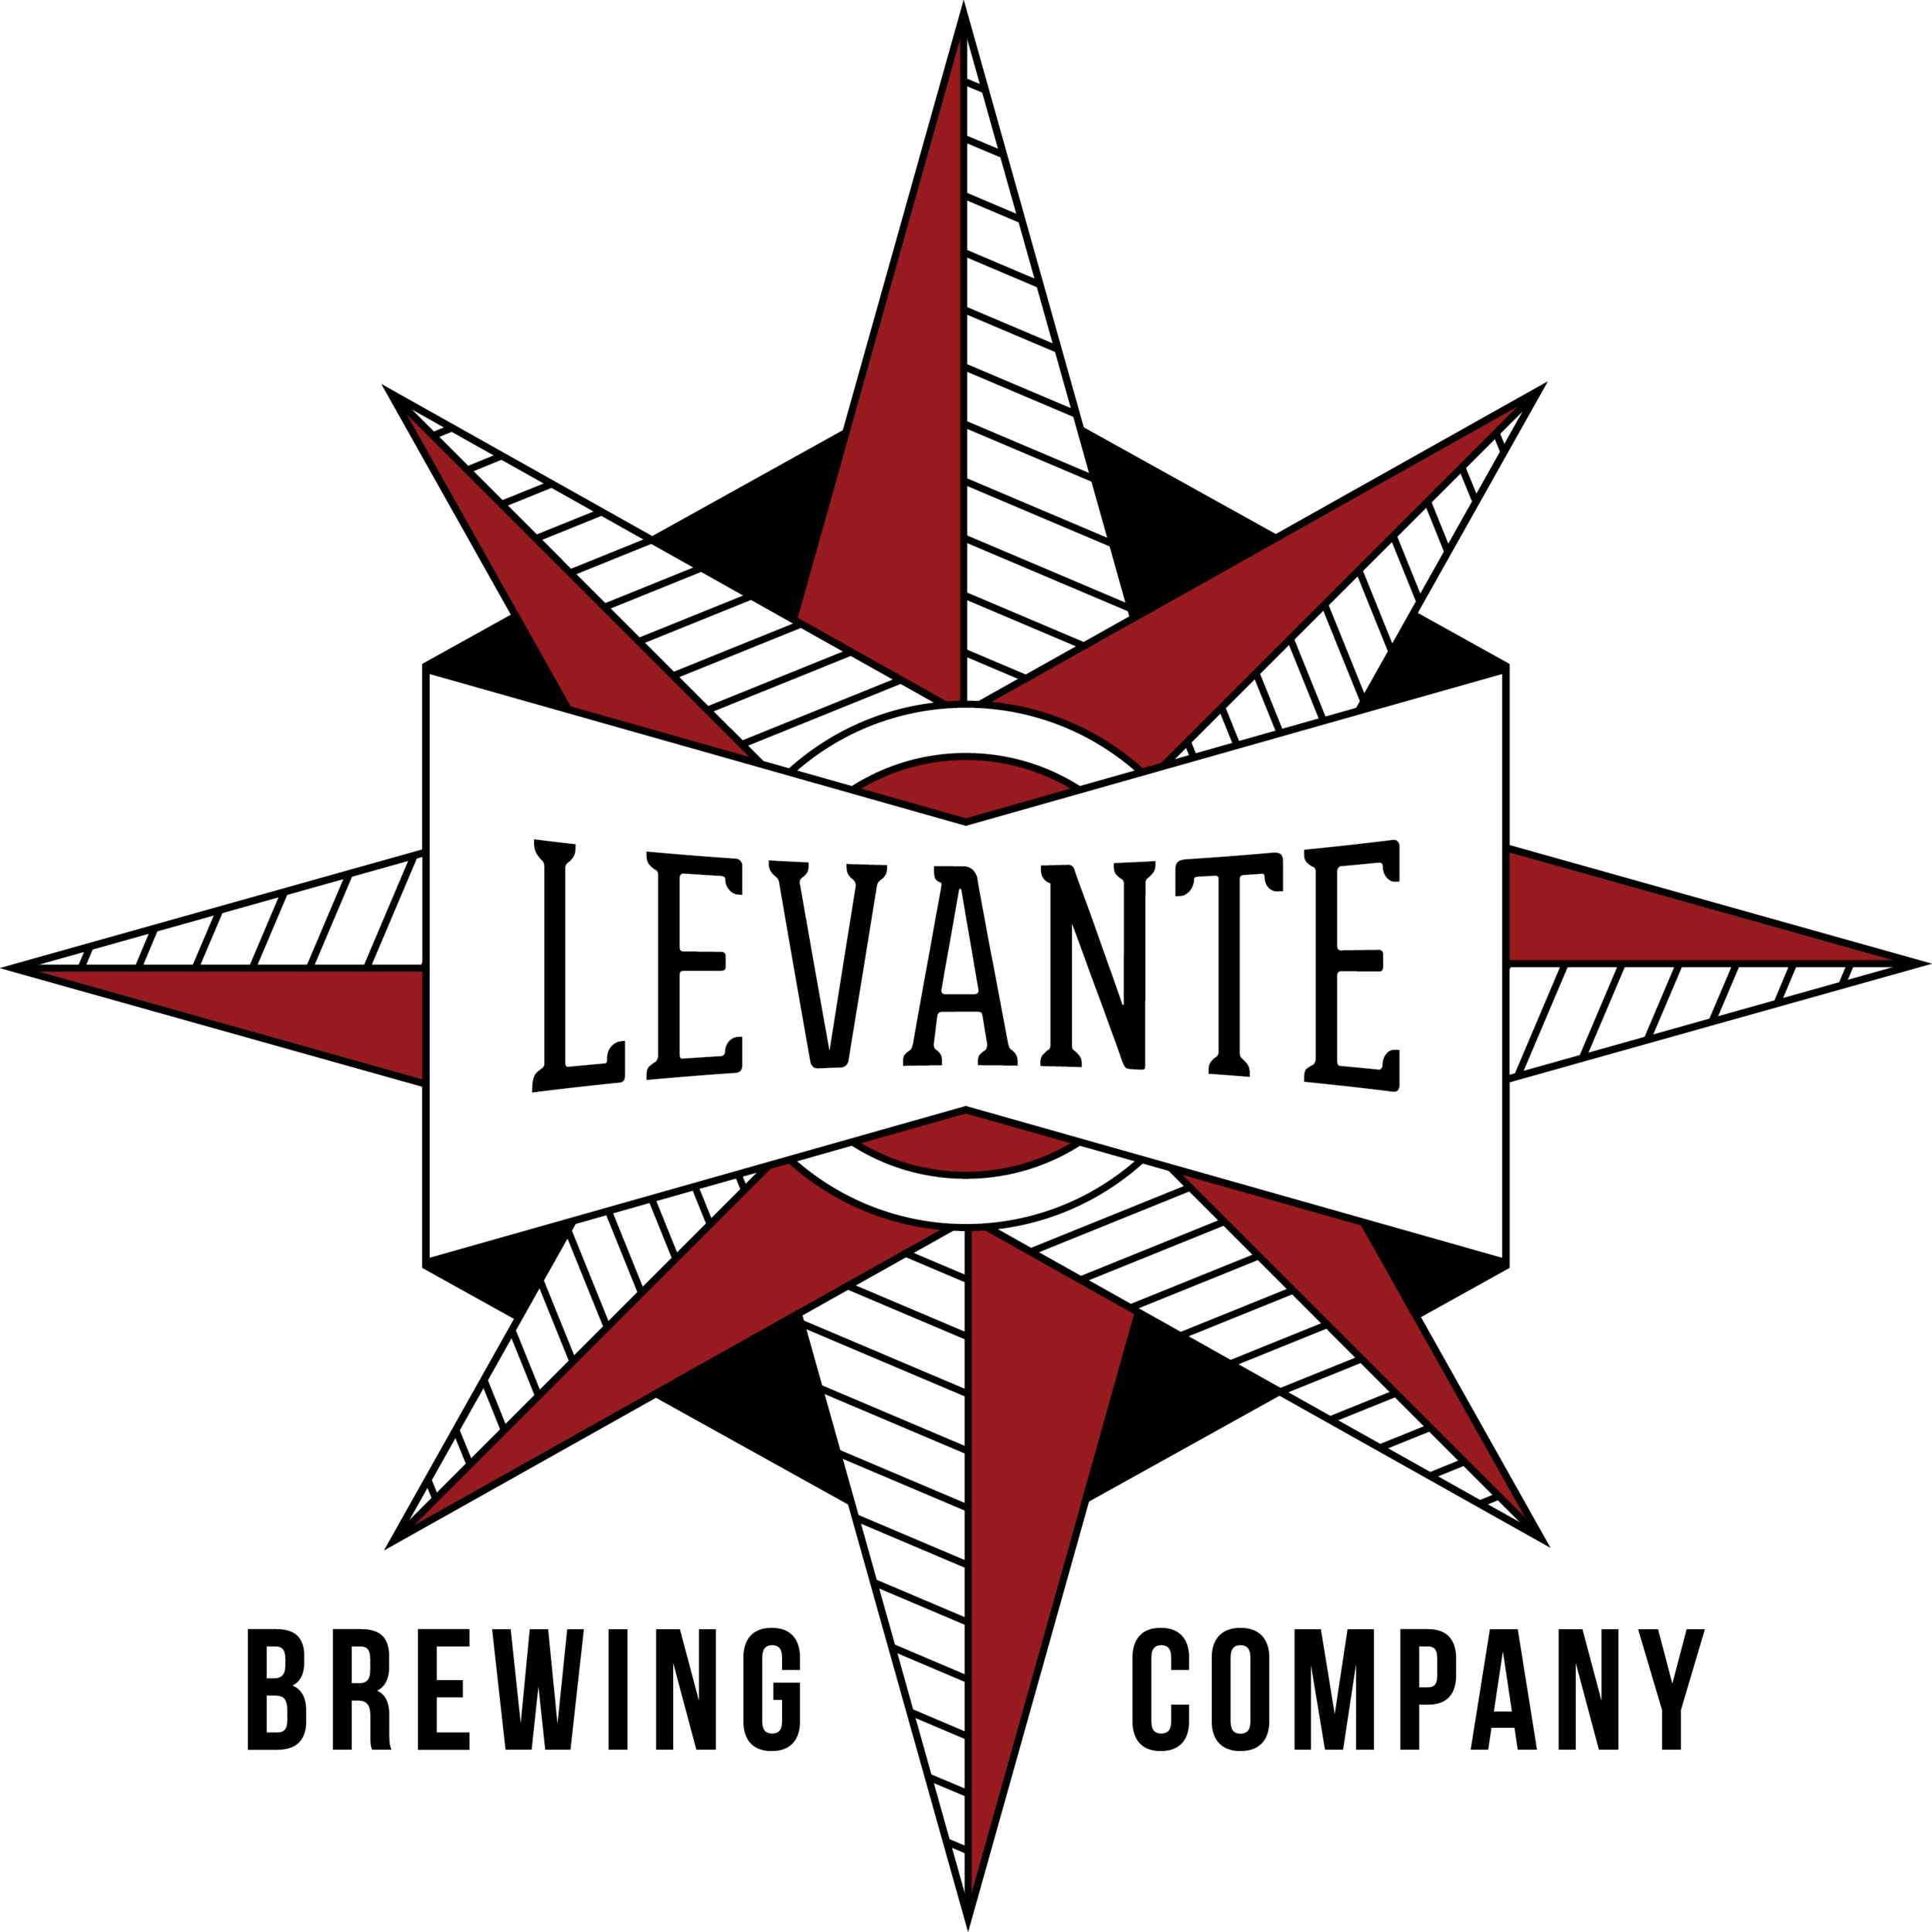 Logo Levante Brewing Company.png